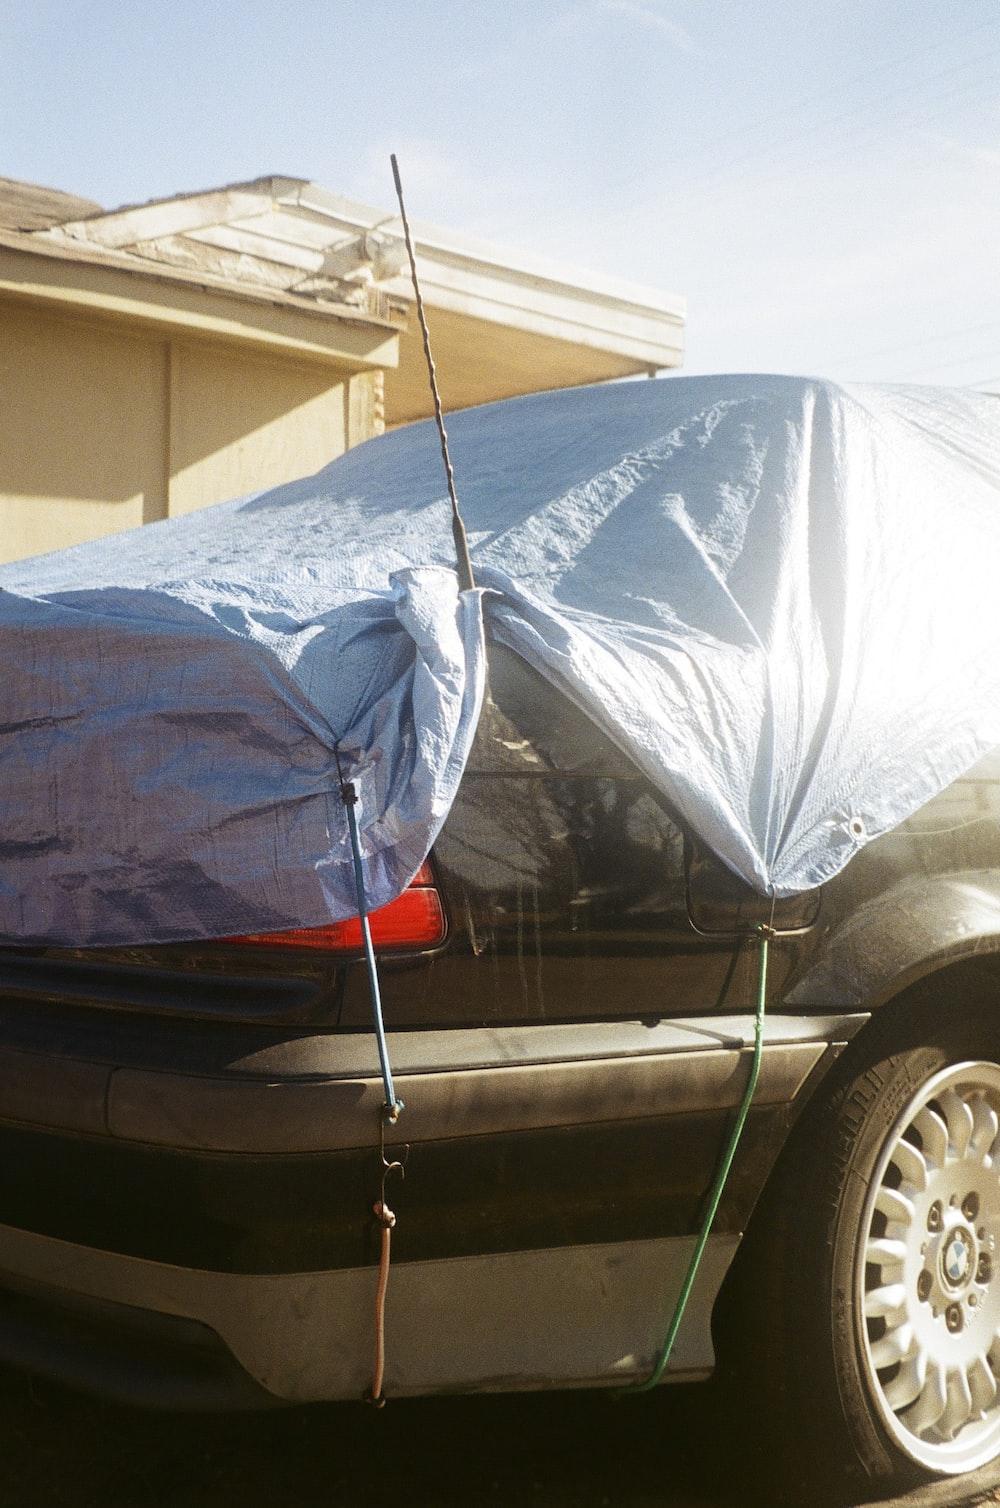 black car with blue umbrella